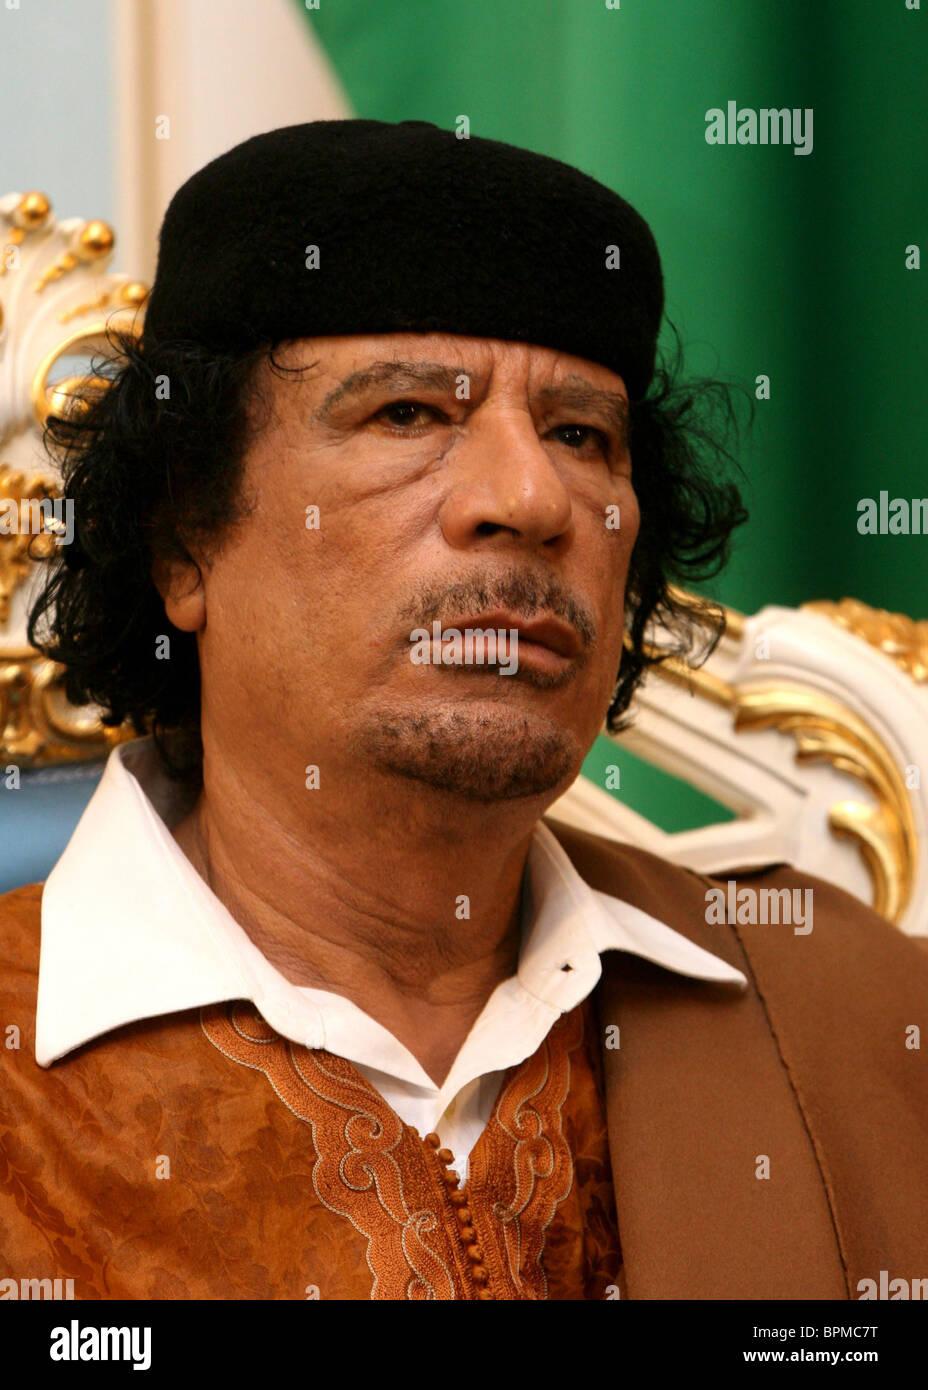 Libyan leader Muammar Gaddafi visits Belarus - Stock Image